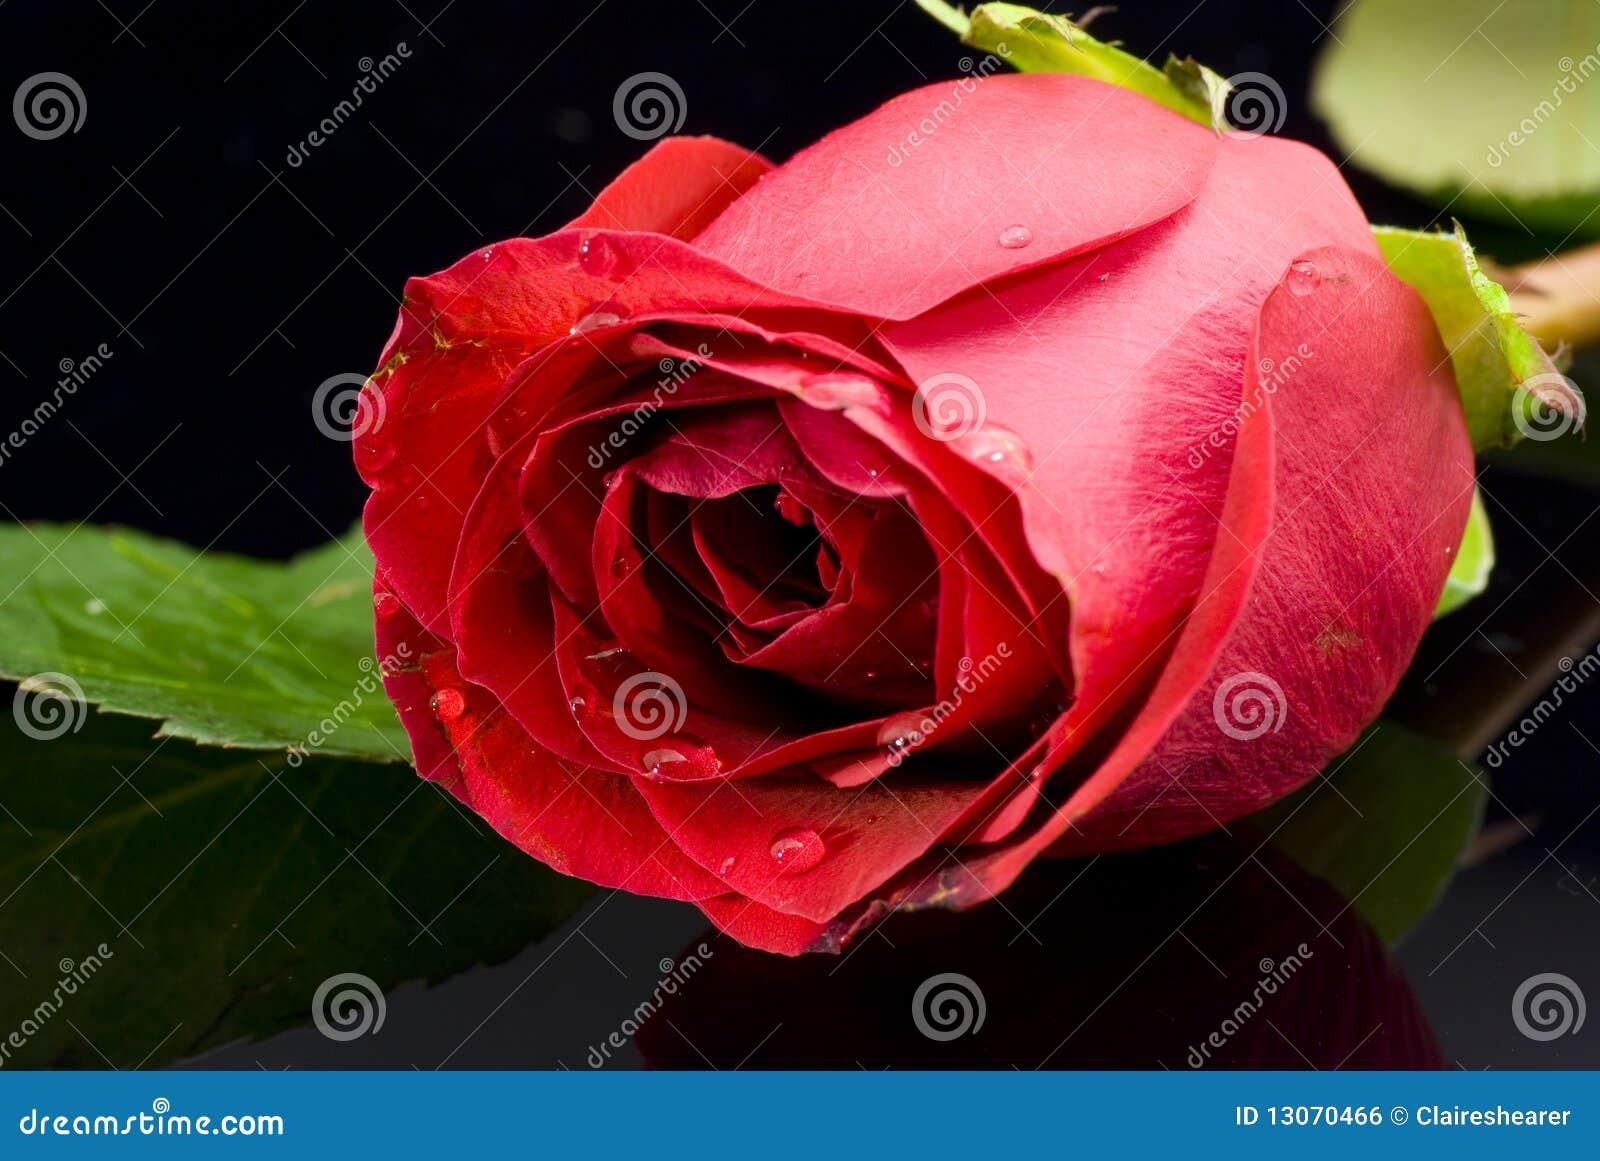 Rose roja en fondo negro